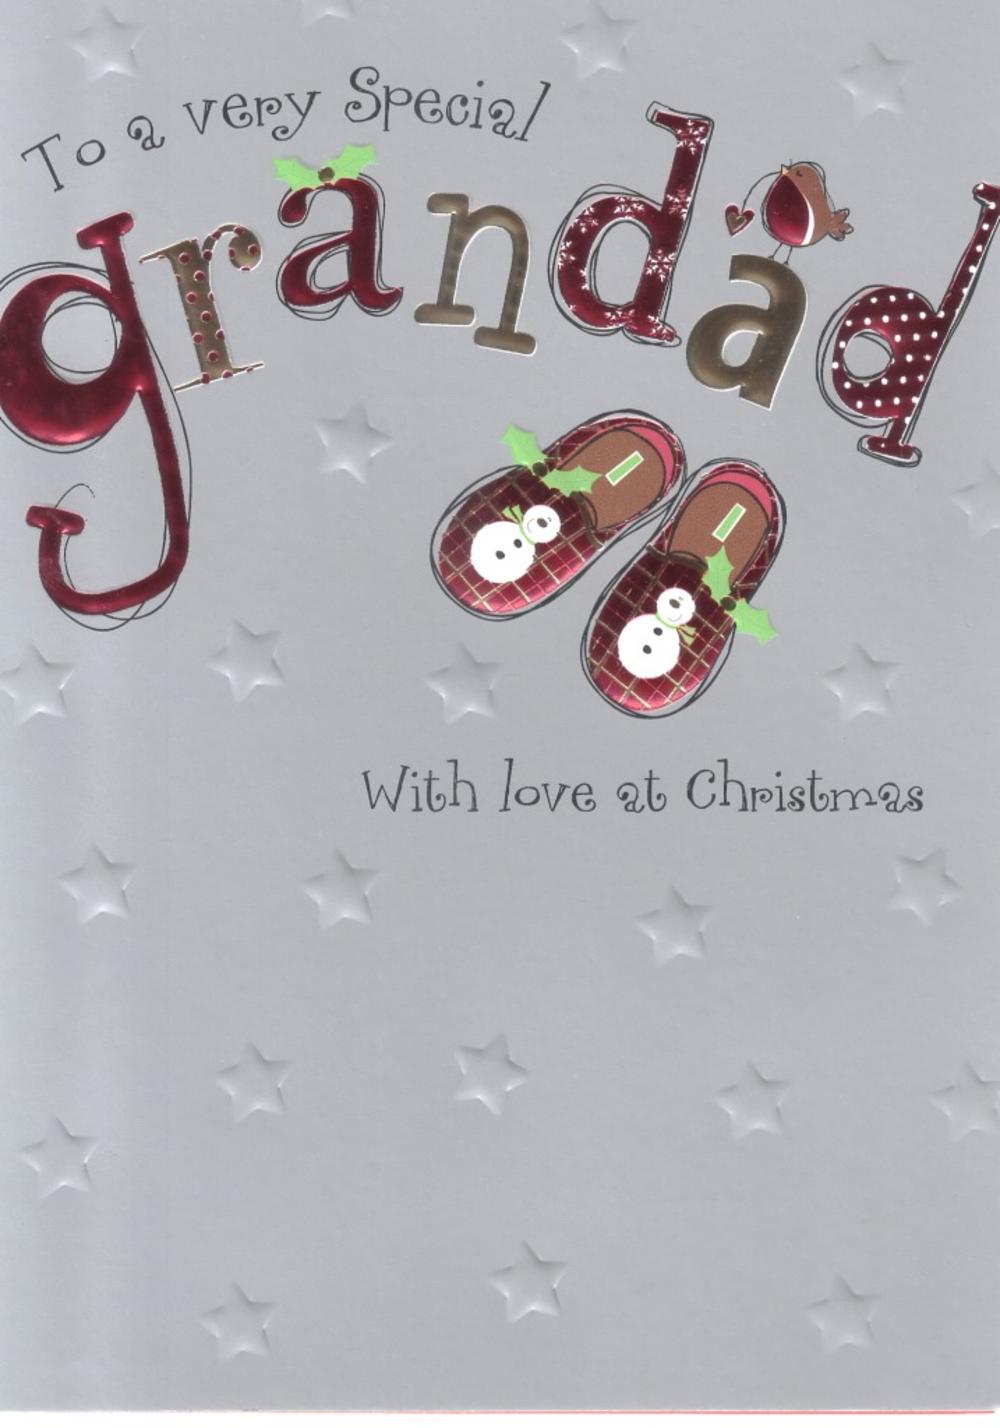 To A Very Special Grandad Christmas Card